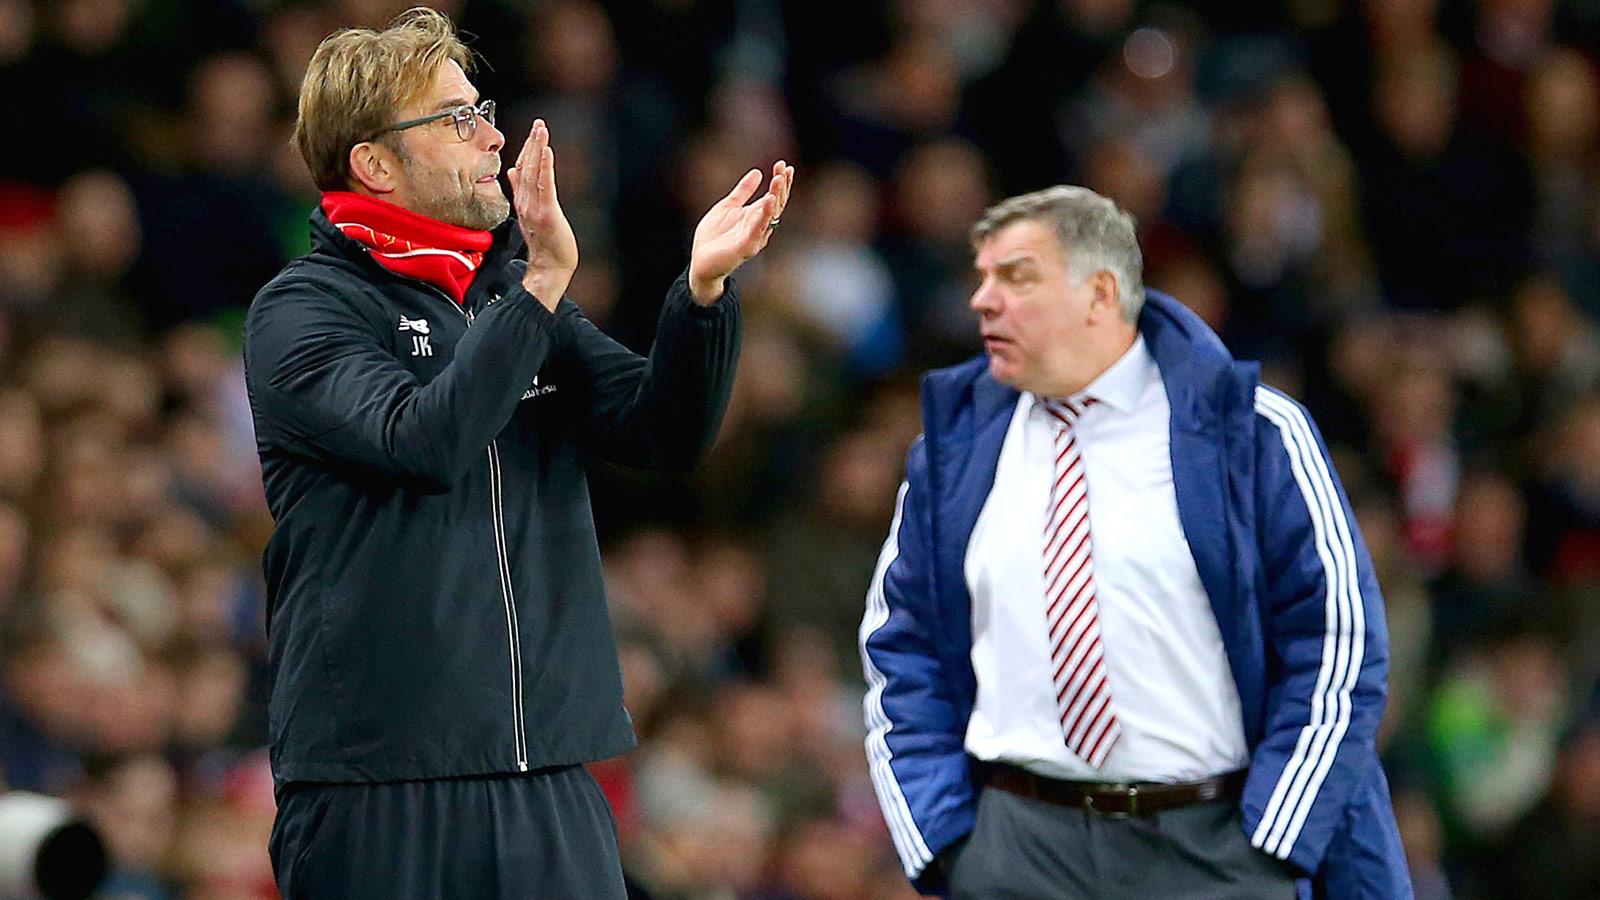 Liverpool boss Klopp hits back at Allardyce over injury claims